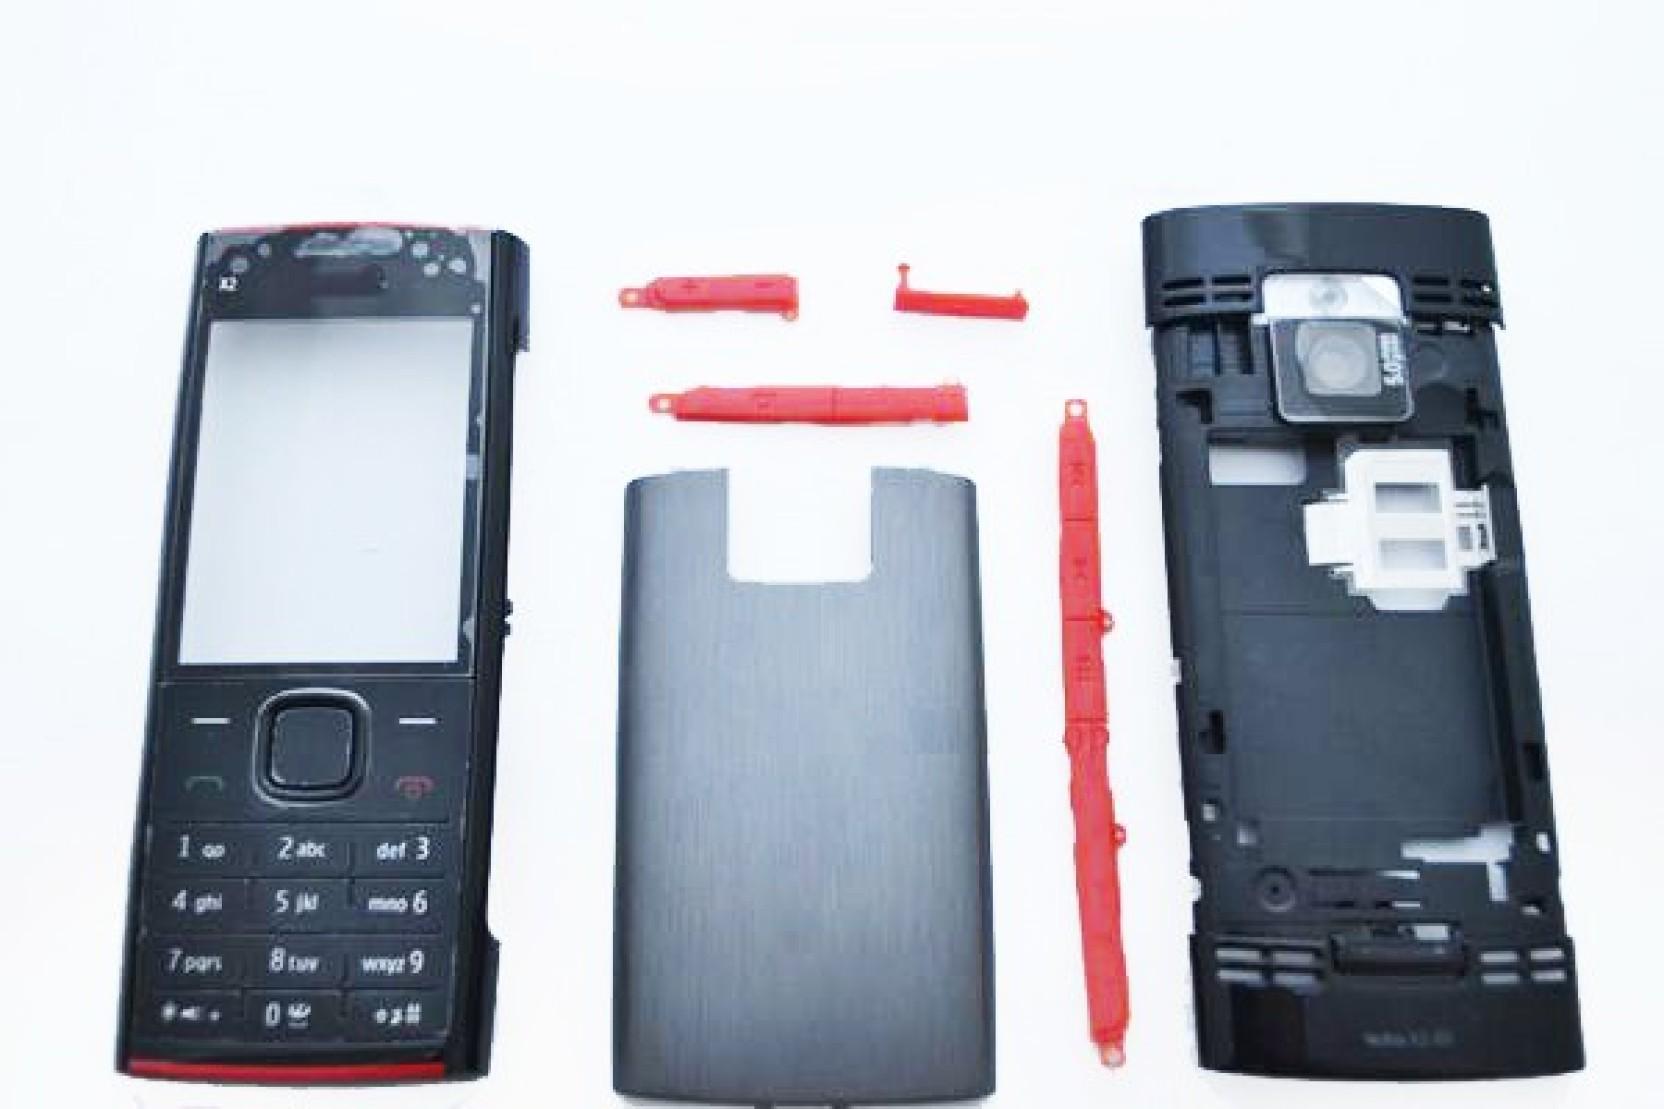 Shop92 Nokia X2 00 Full Panel Buy Share